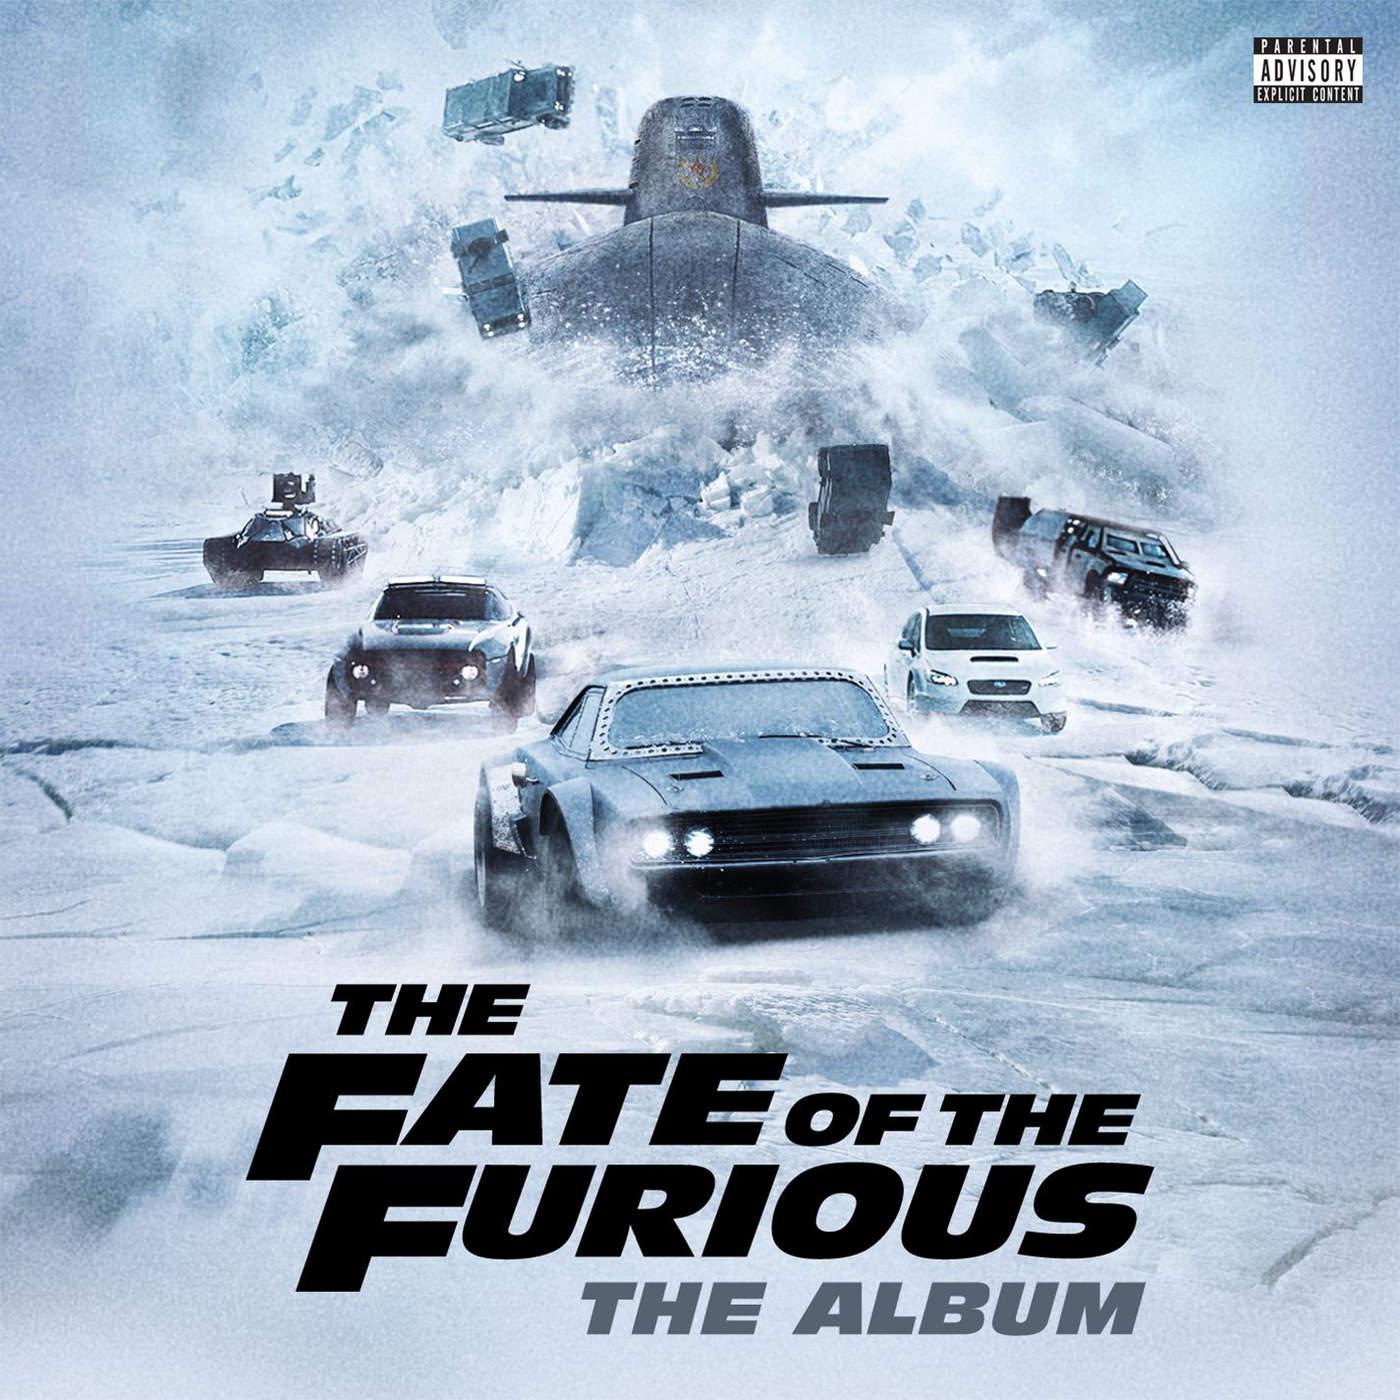 Young Thug, 2 Chainz, Wiz Khalifa & PnB Rock - Gang Up - Single Cover